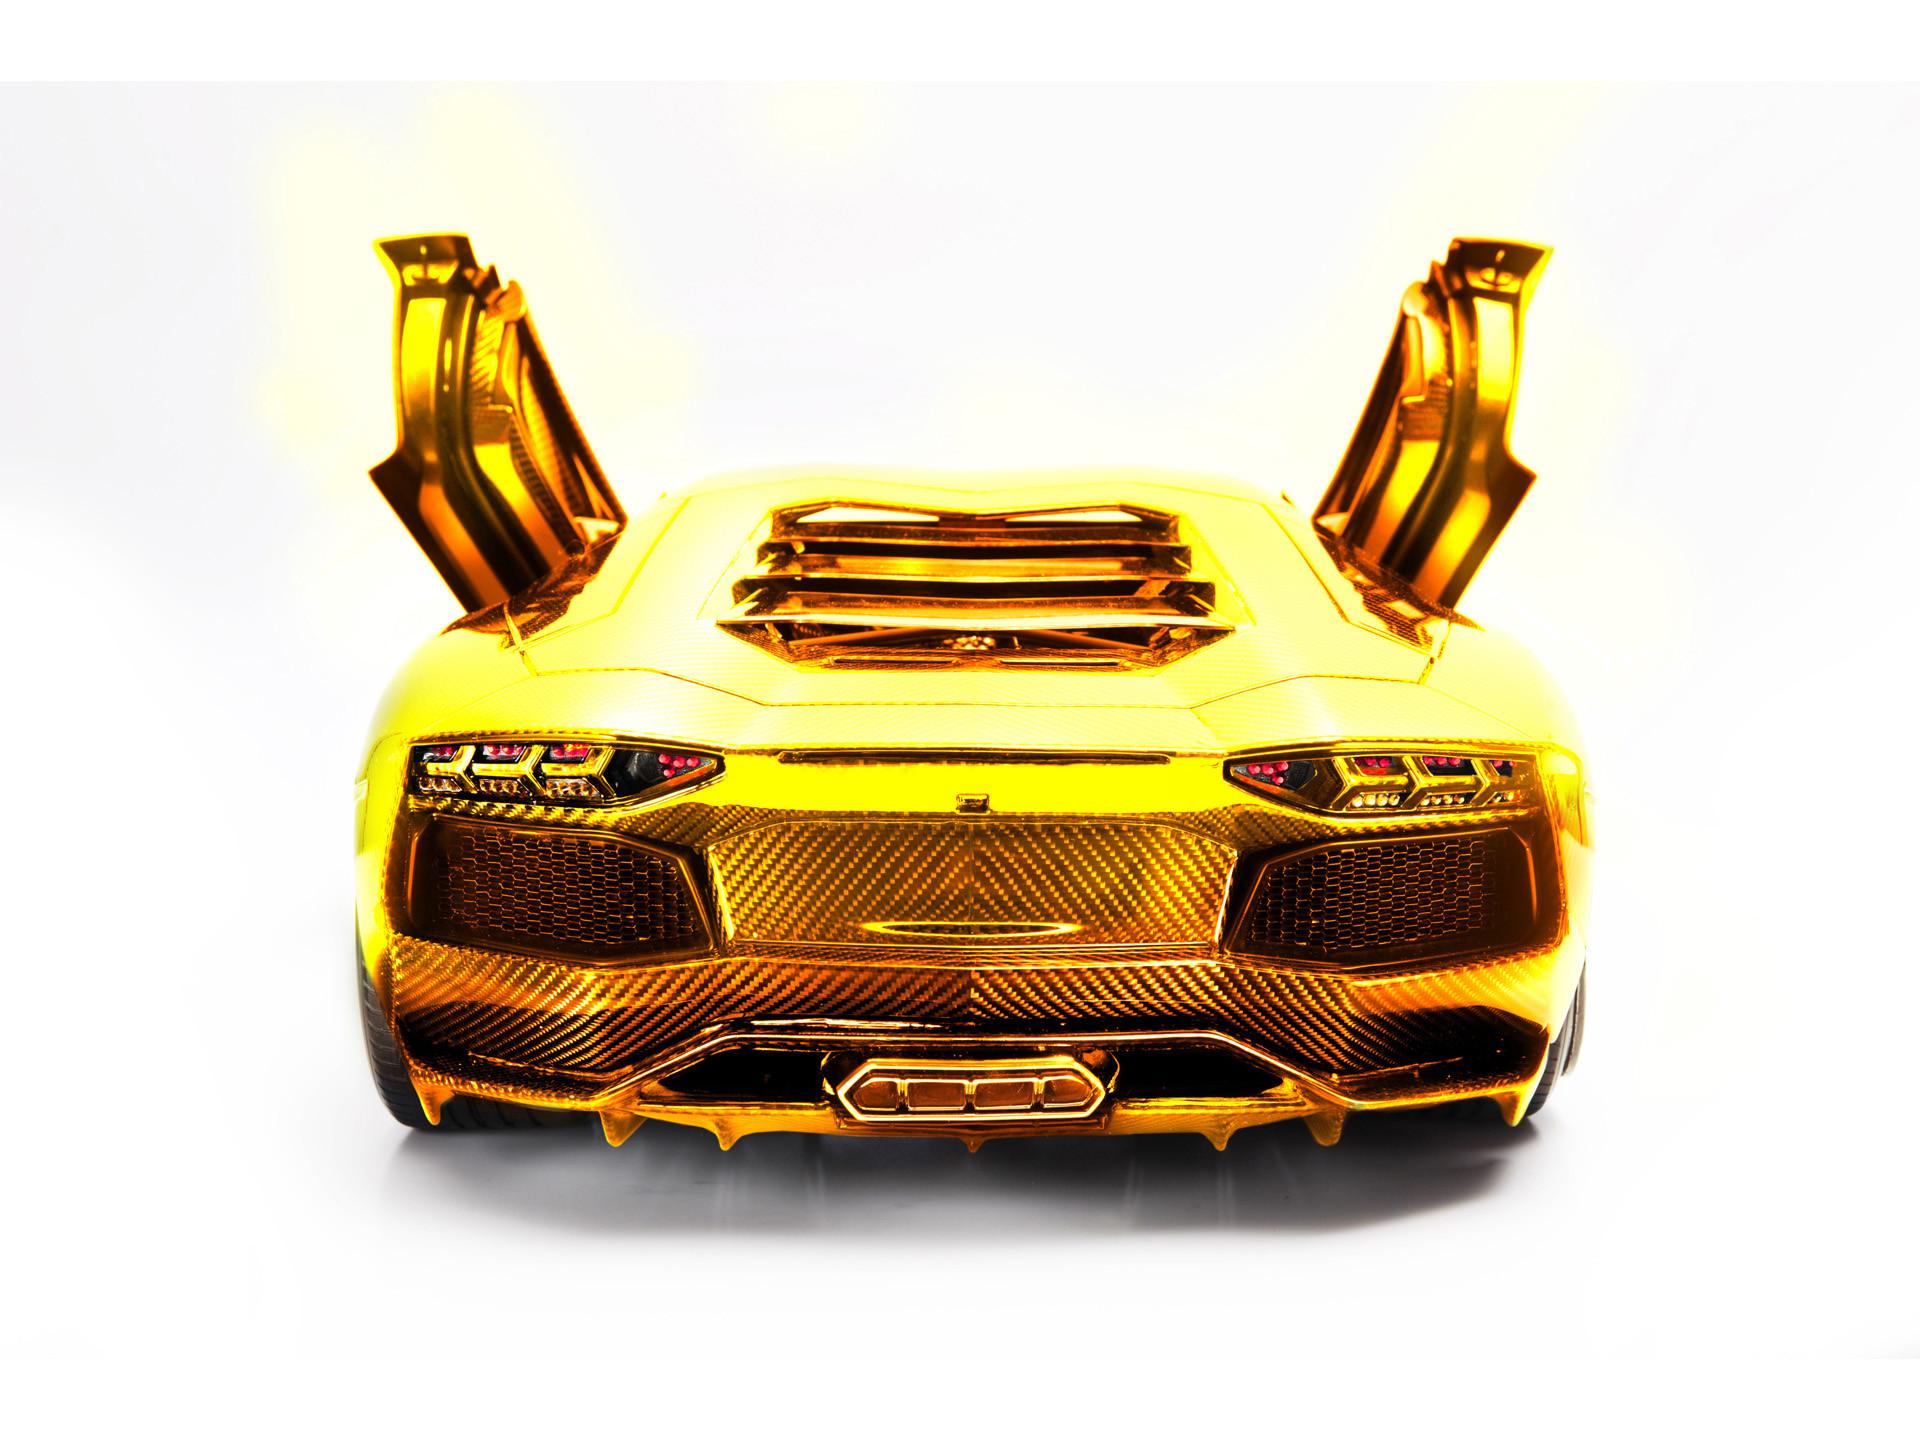 2012 Lamborghini Aventador LP 700-4 Model by Robert Gulpen Engineering –  Gold Rear Open Doors – – Wallpaper